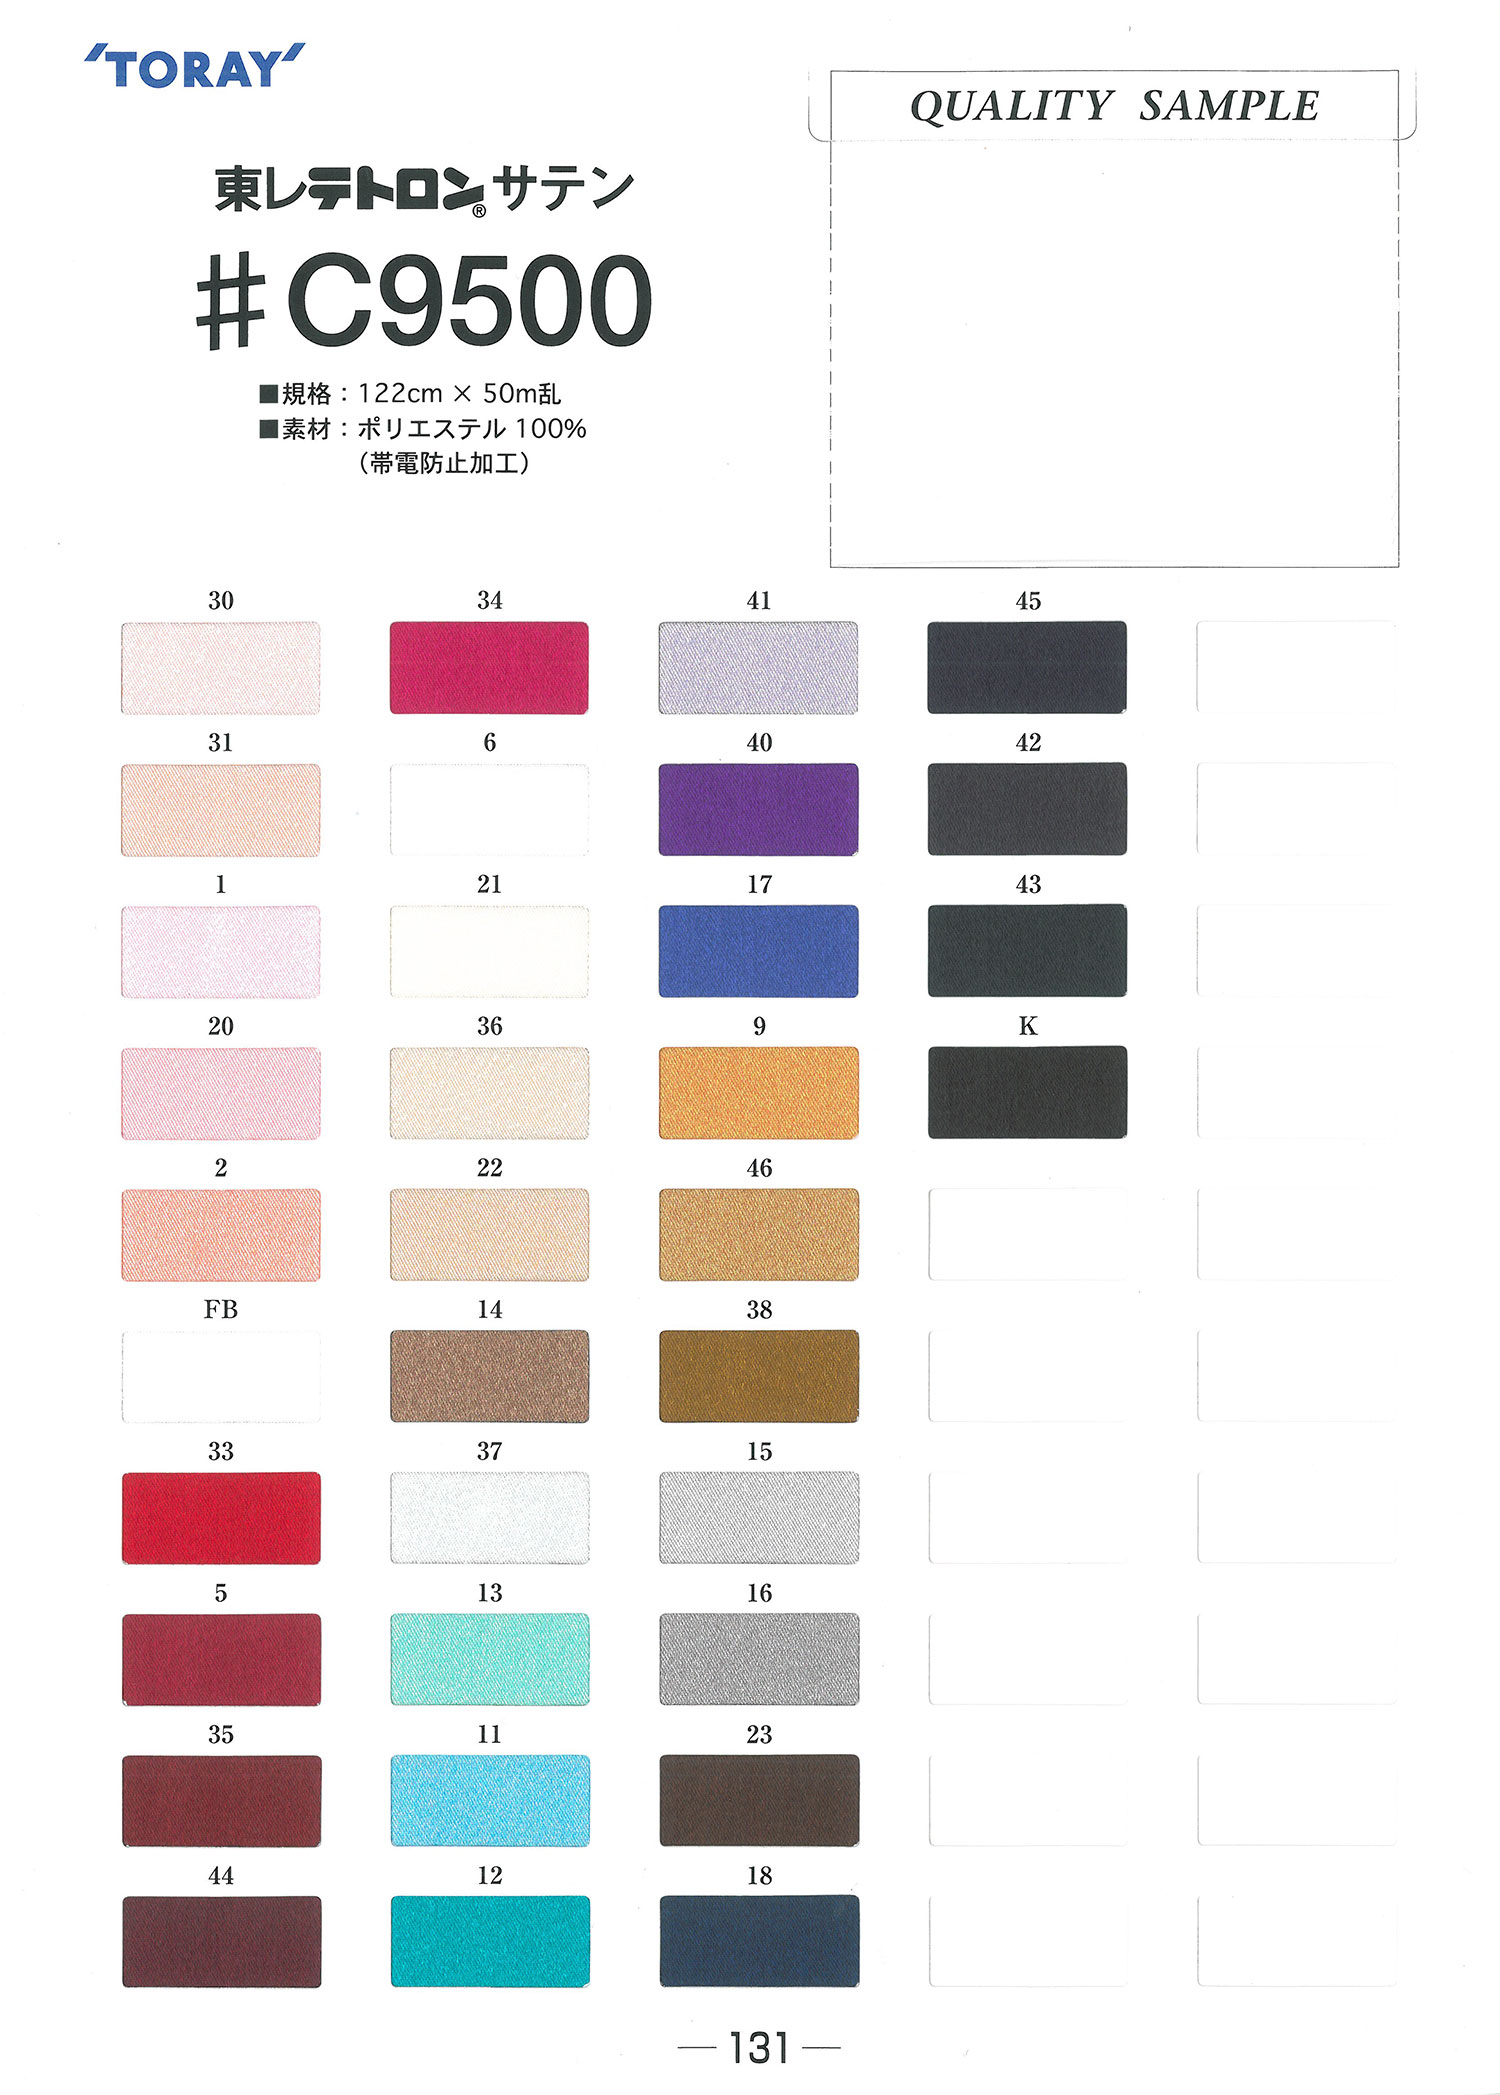 C9500 コスミックサテン[裏地] 東レ/オークラ商事 - ApparelX アパレル資材卸通販